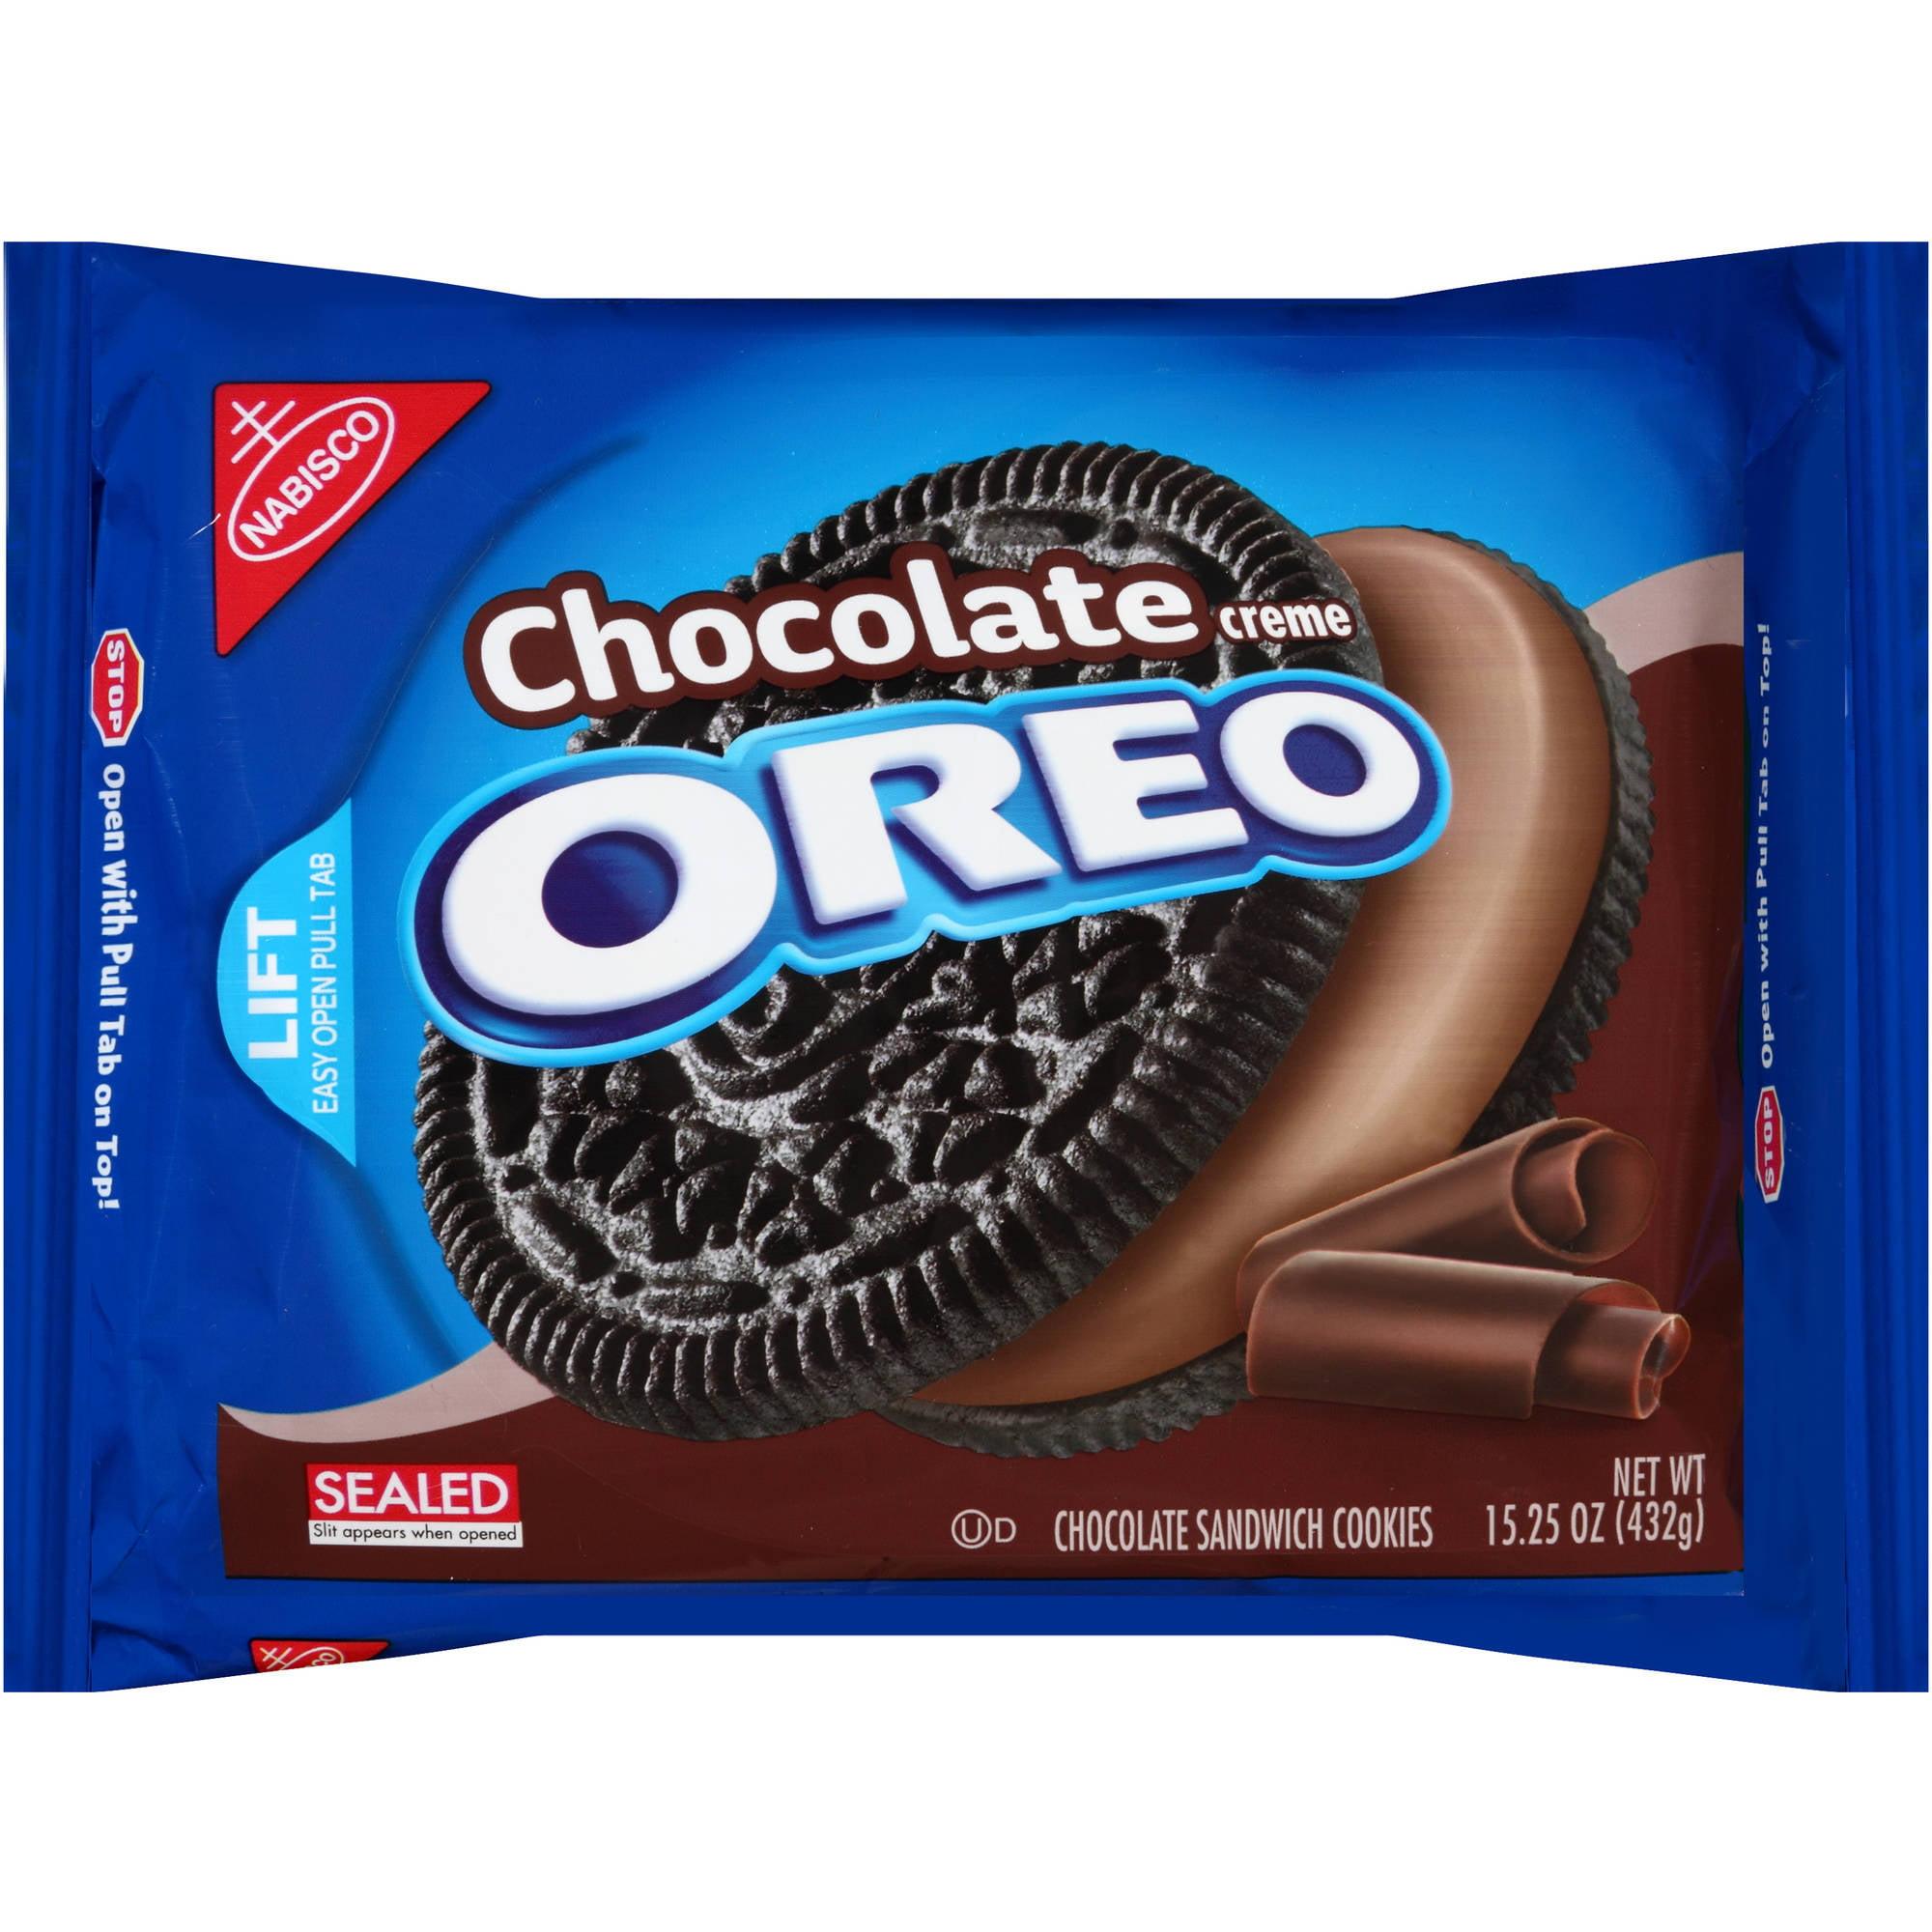 Nabisco Oreo Chocolate Creme Chocolate Sandwich Cookies, 15.25 oz